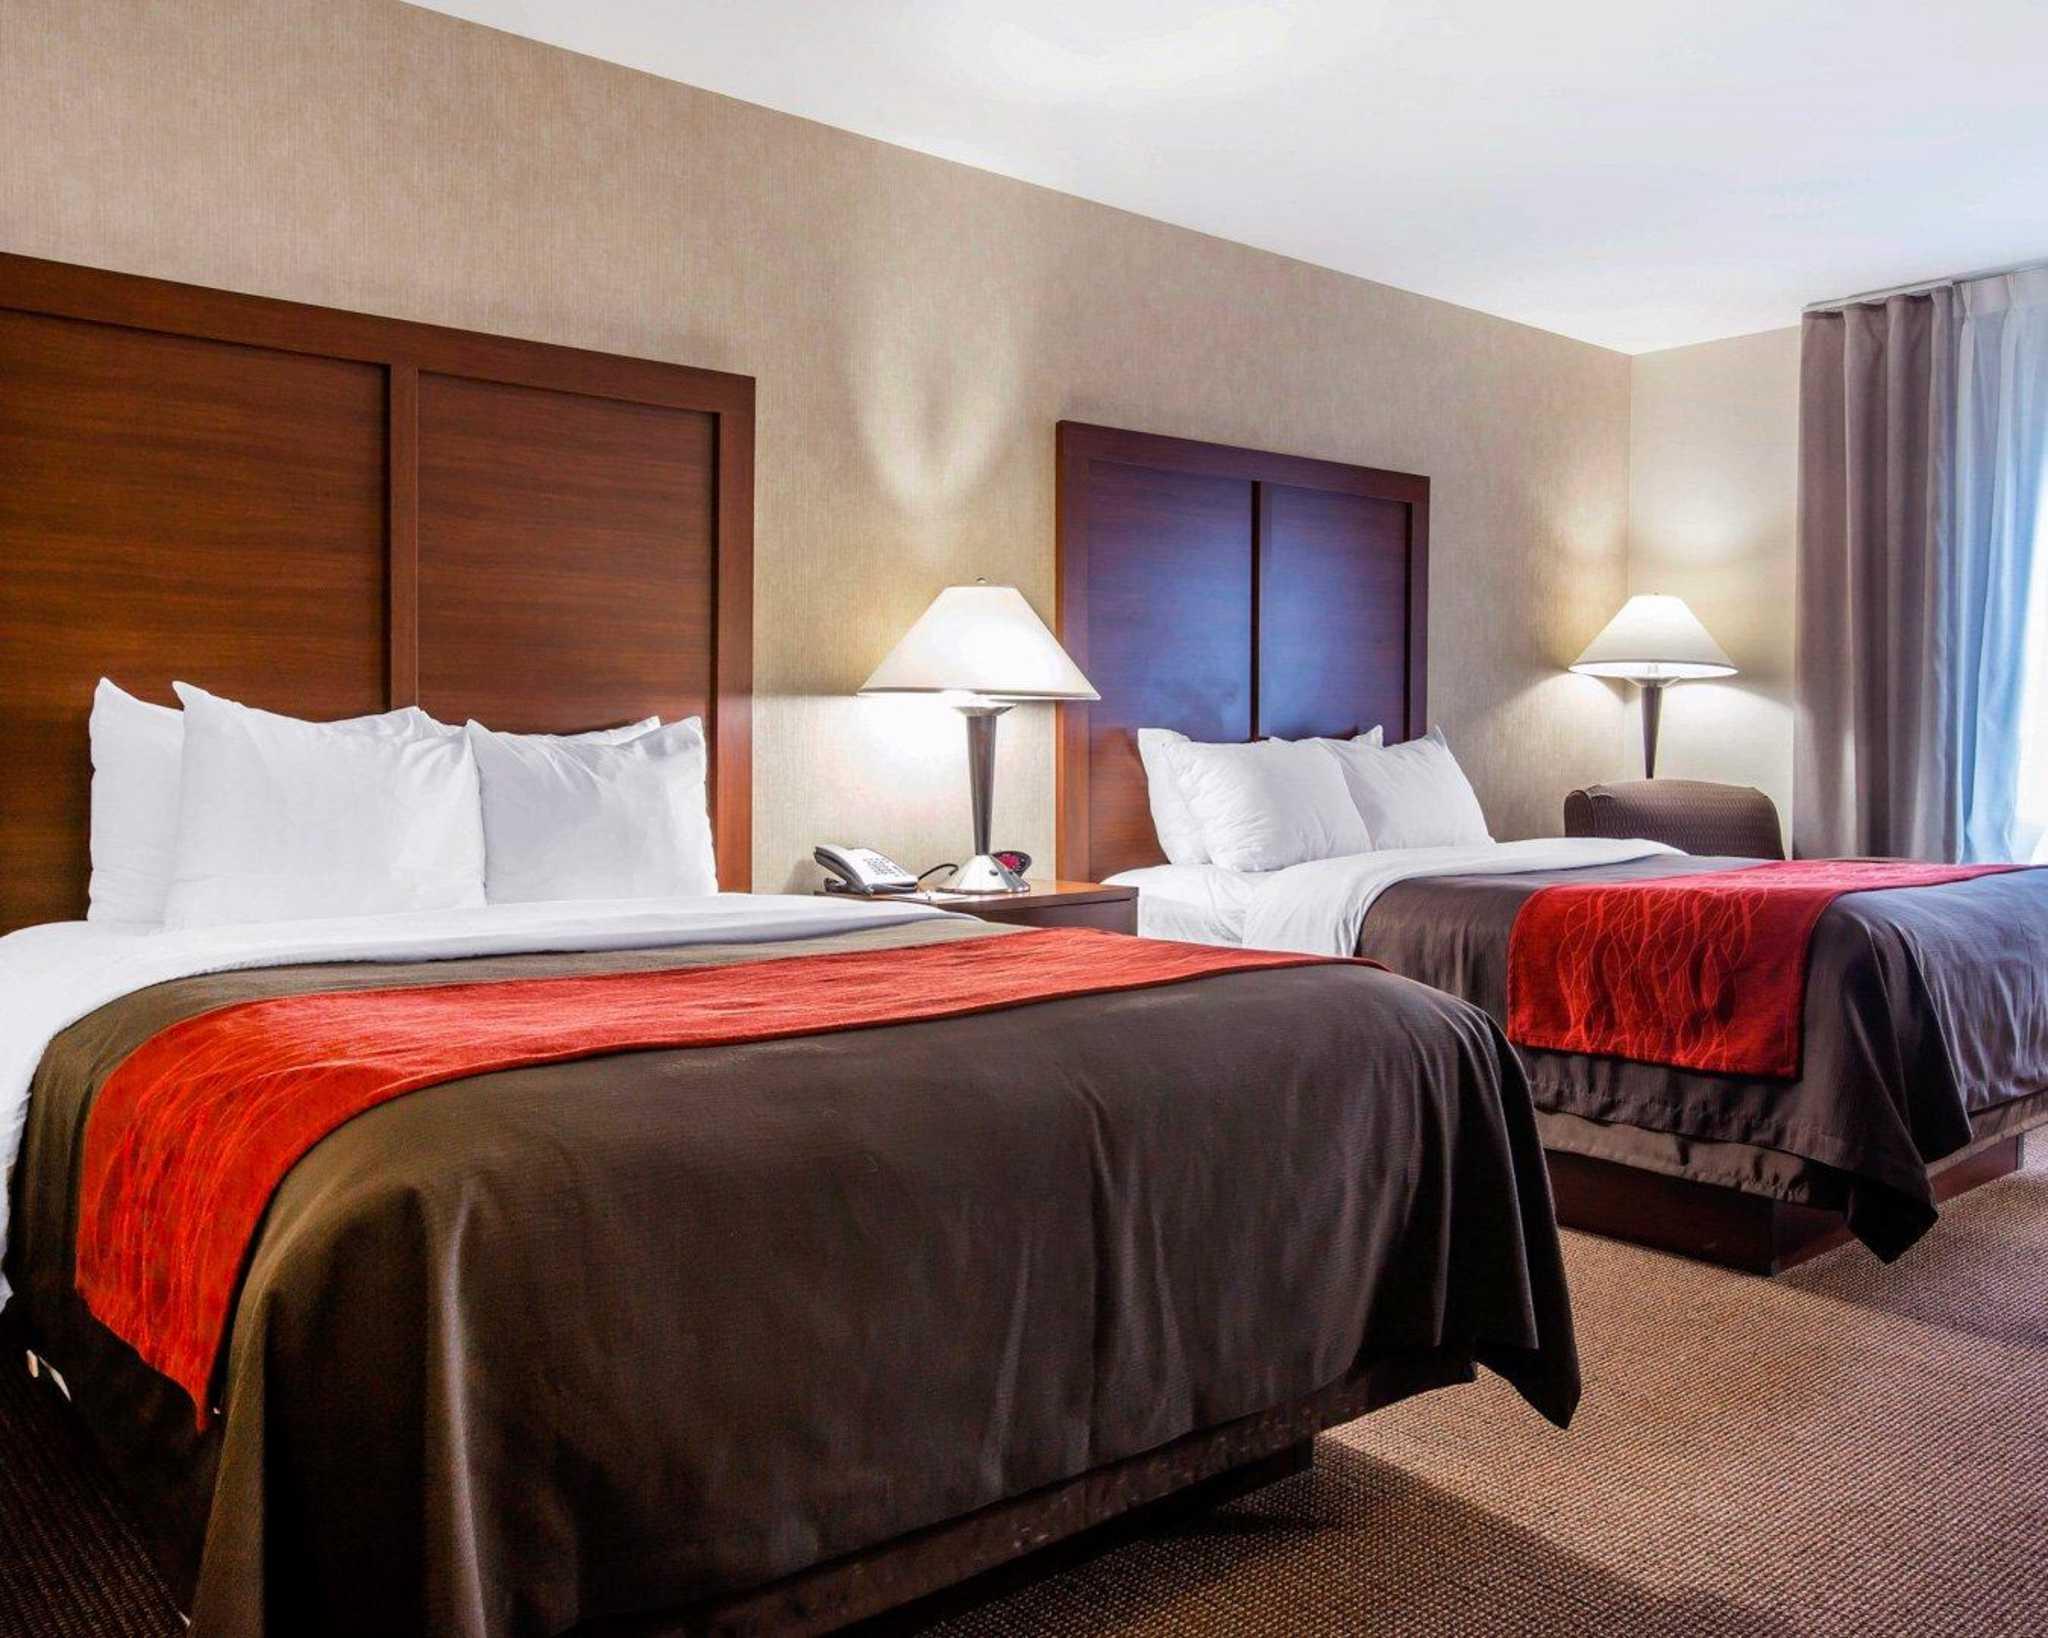 Comfort Inn & Suites adj to Akwesasne Mohawk Casino image 14